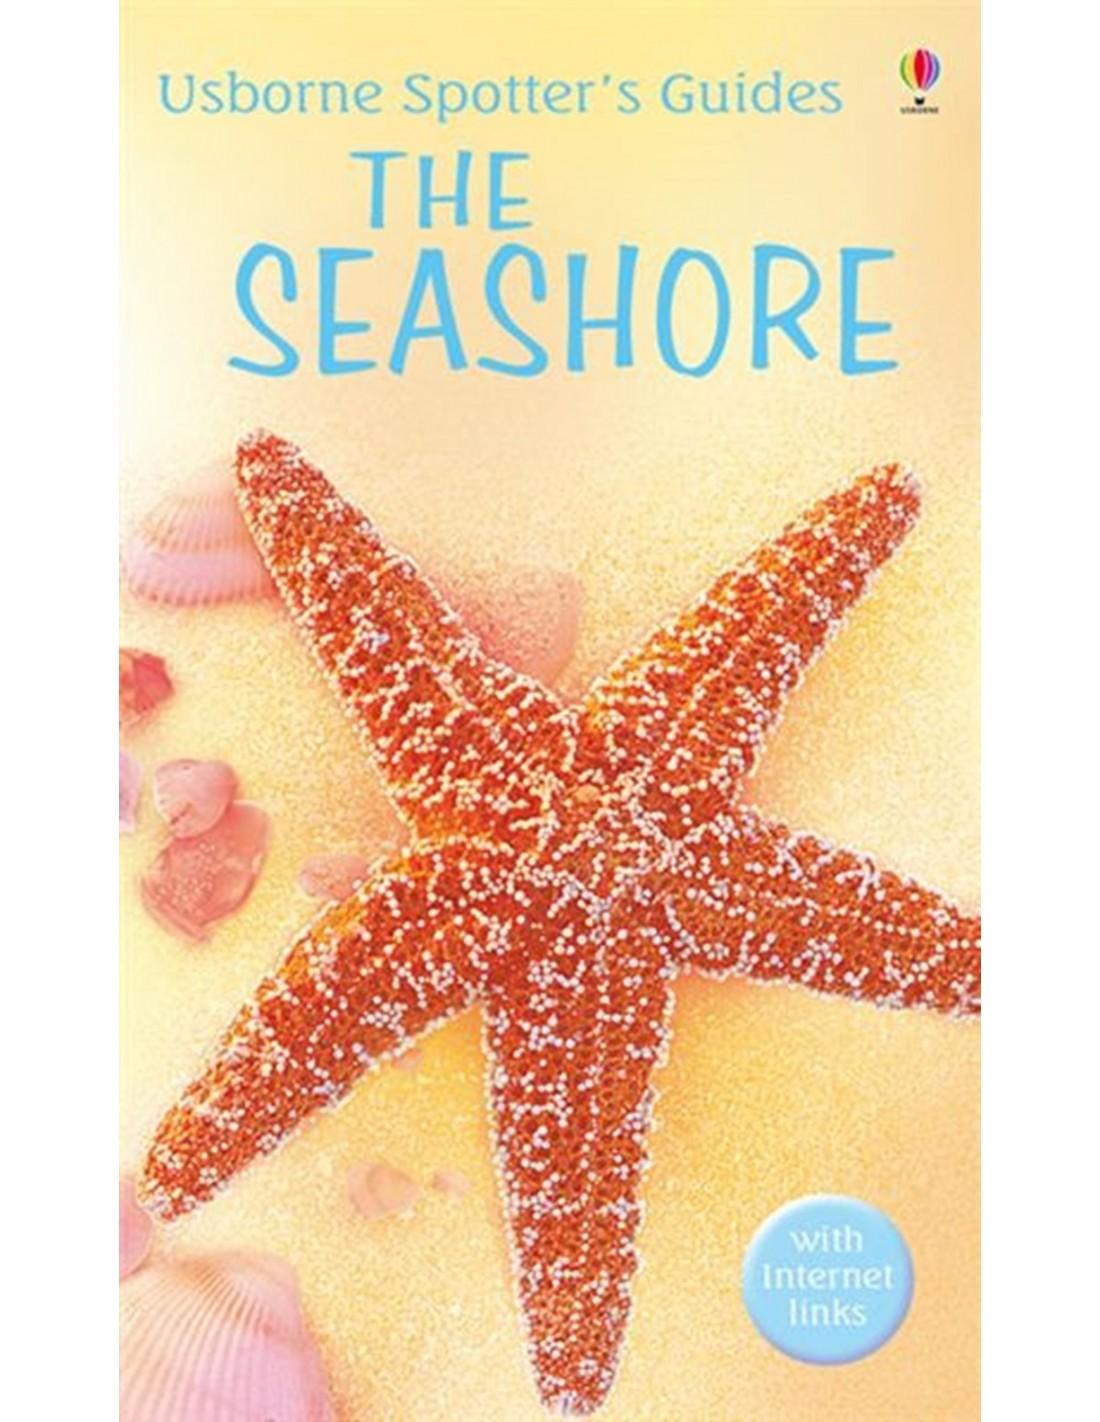 Spotter's Guides: Seashore